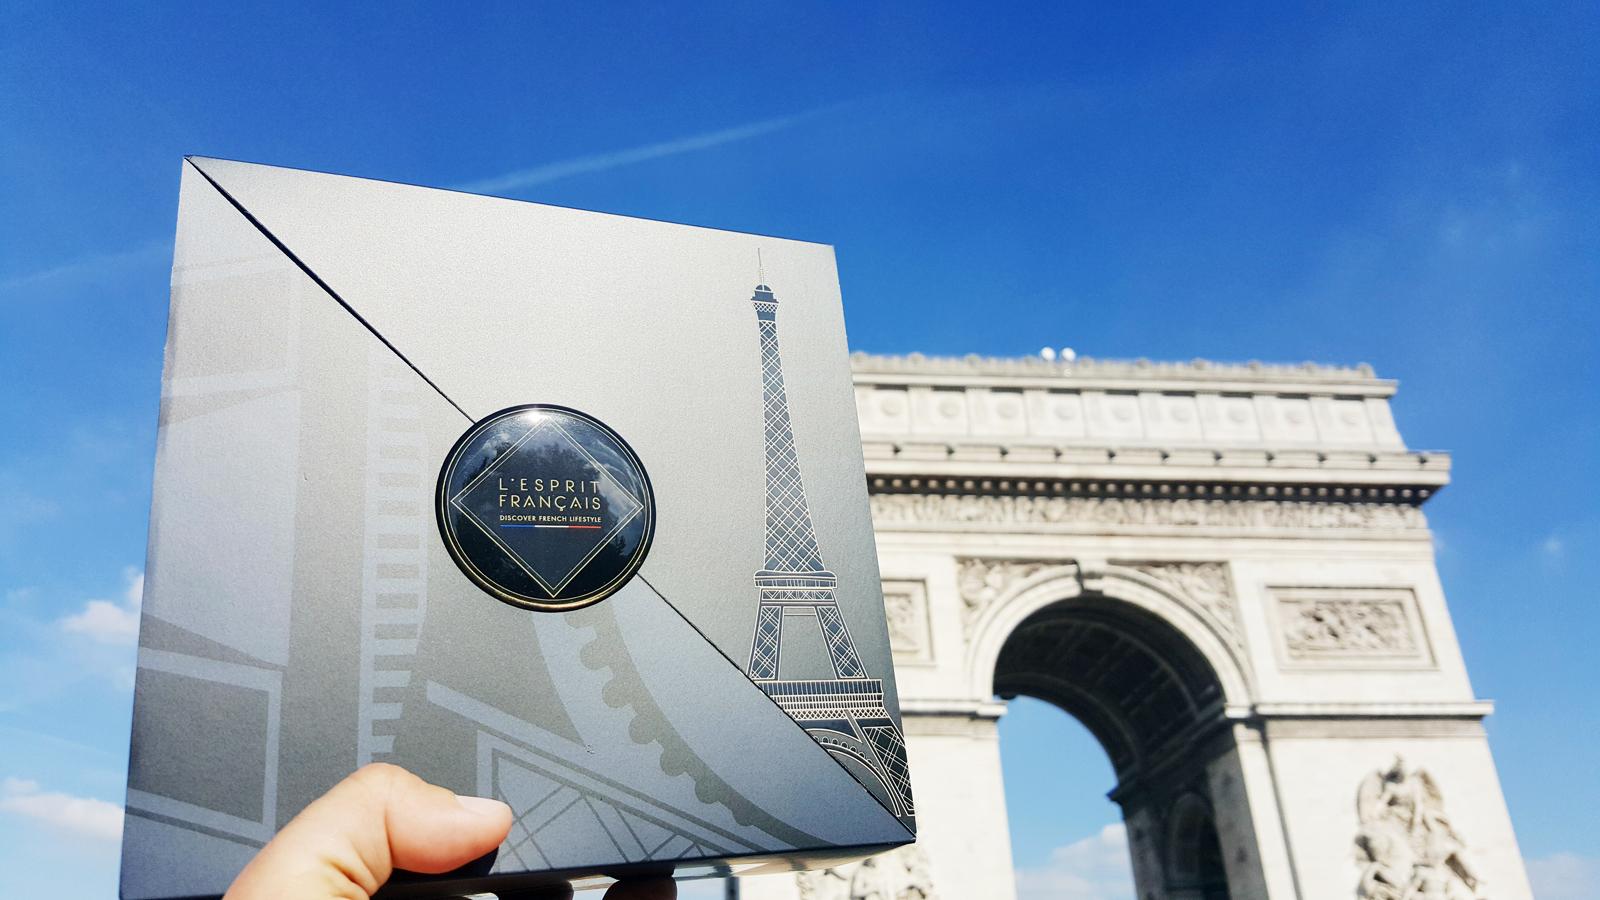 L esprit francais gift box collection Paris City Guide discover french style the best way experience the parisian lifestyle arc de triomphe photo usofparis blog